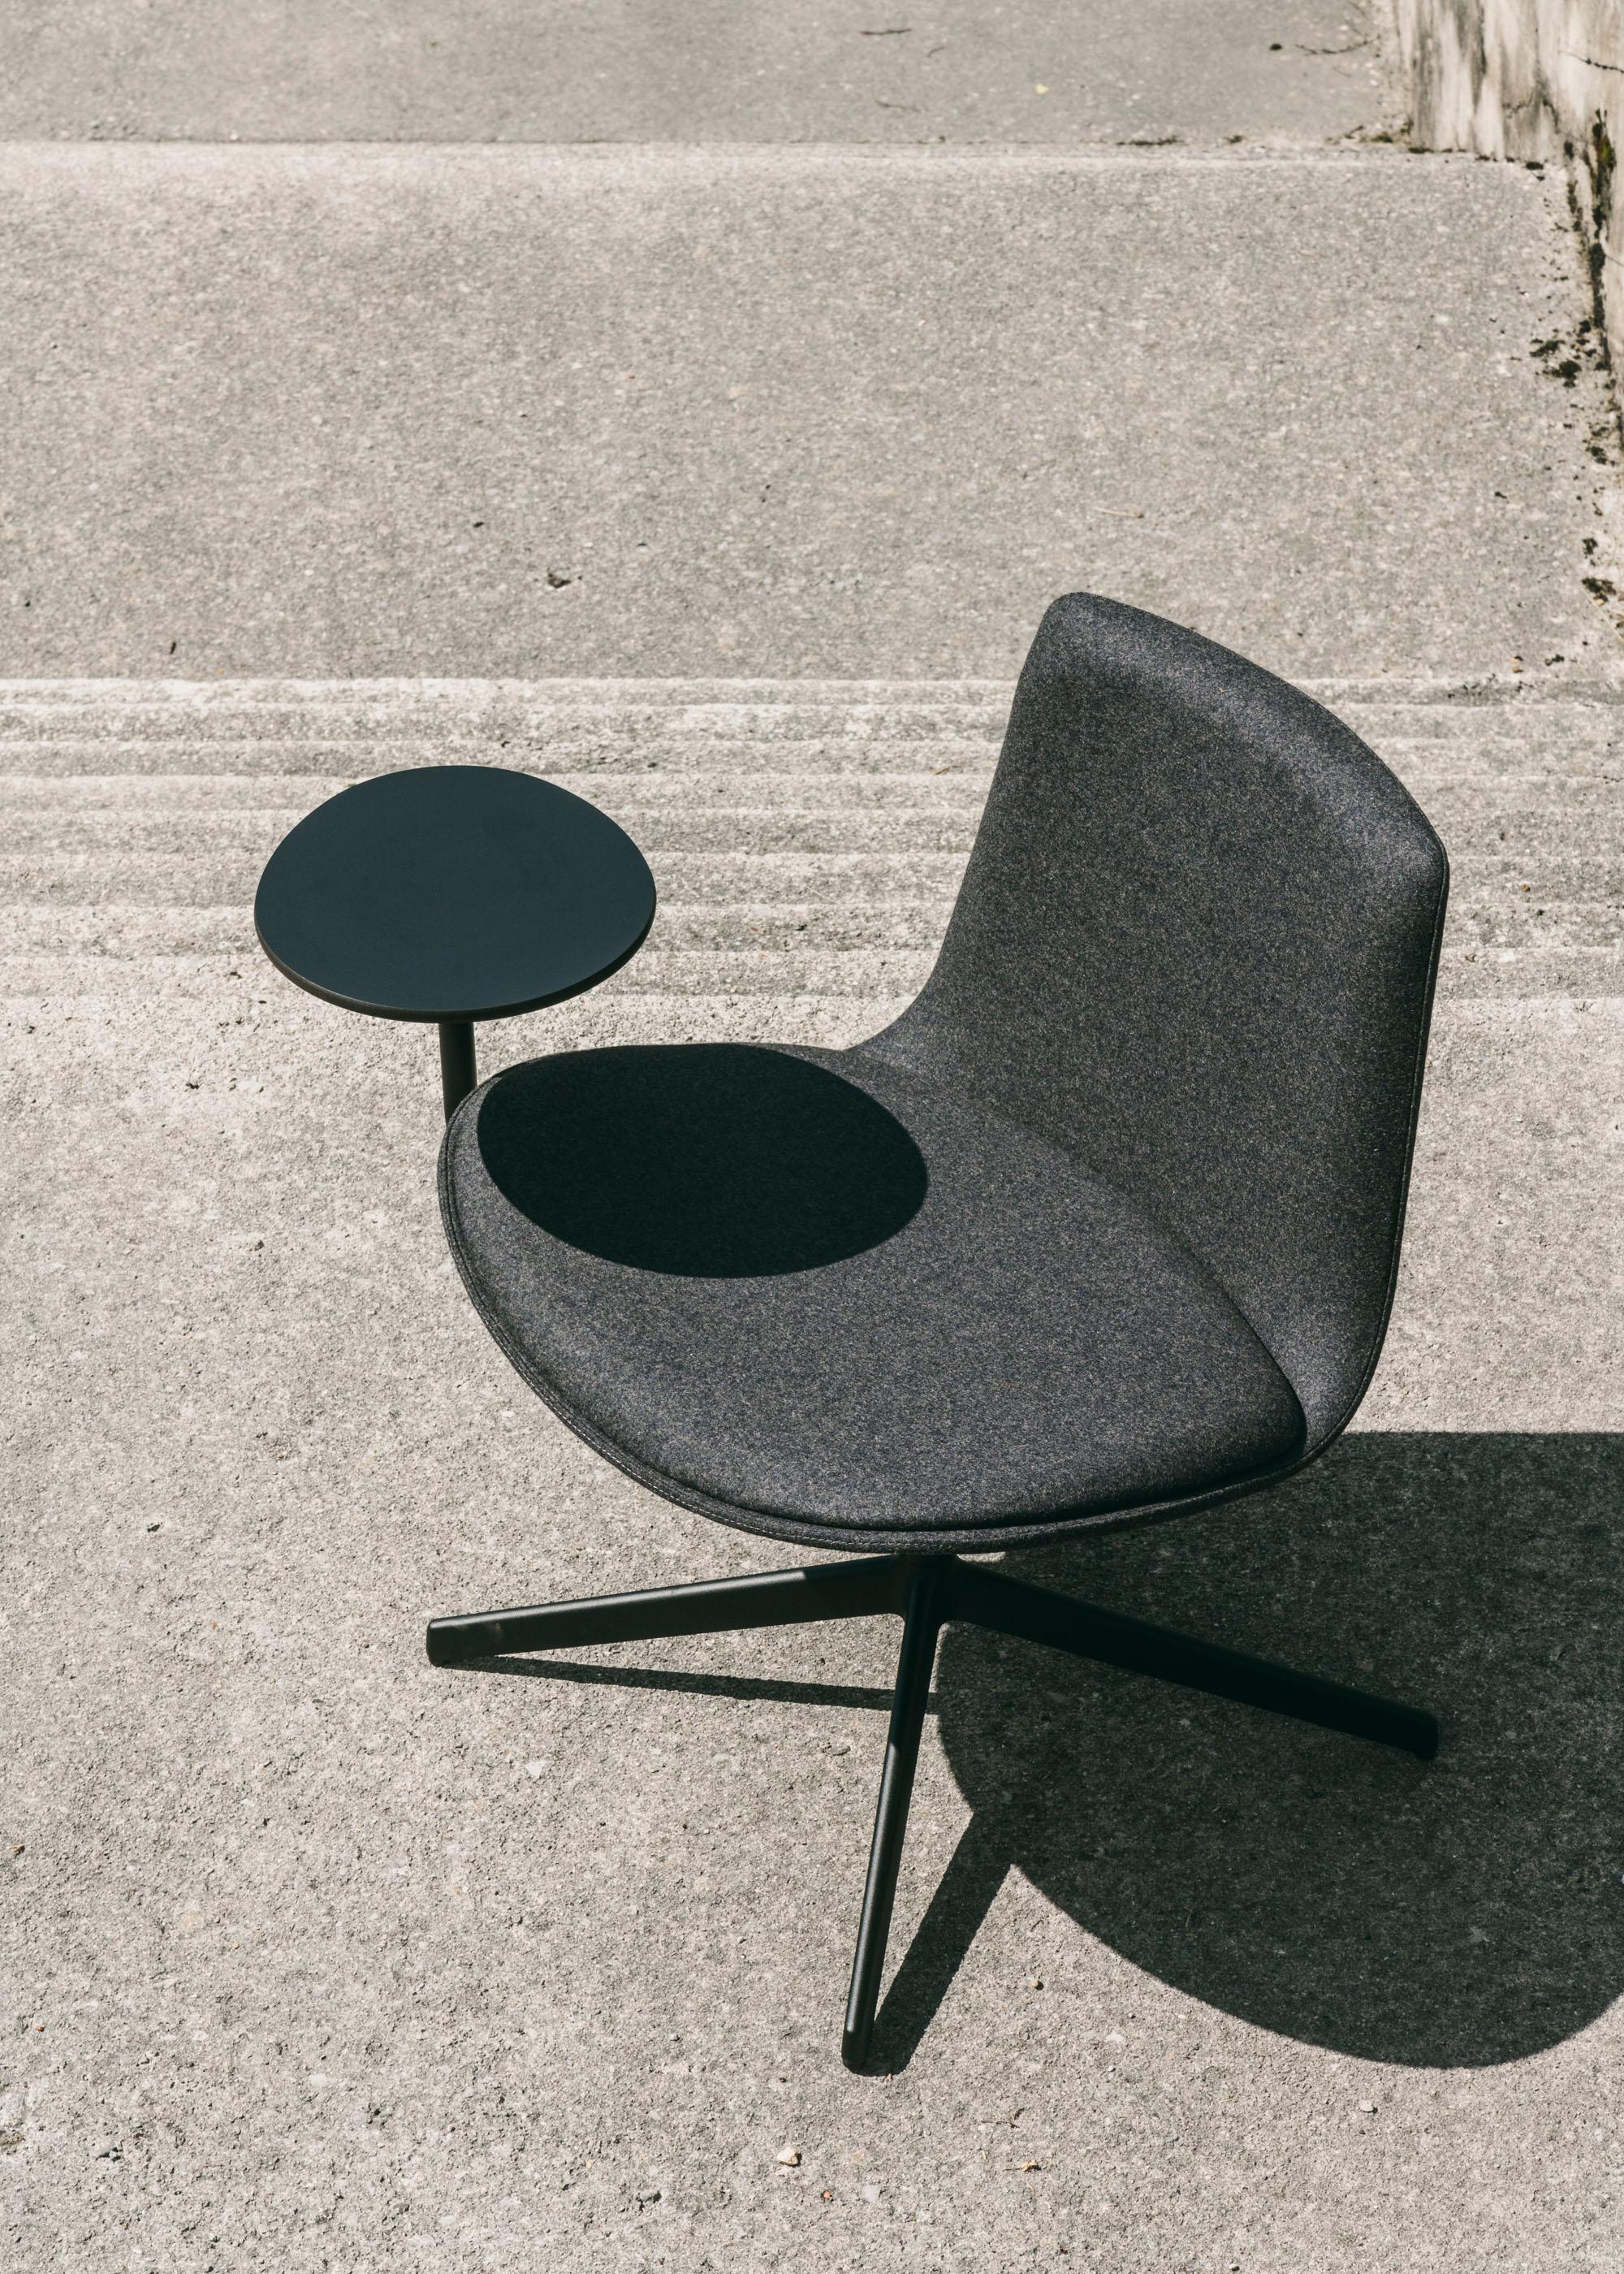 #furniture #enea #design #clase #basque #chairs